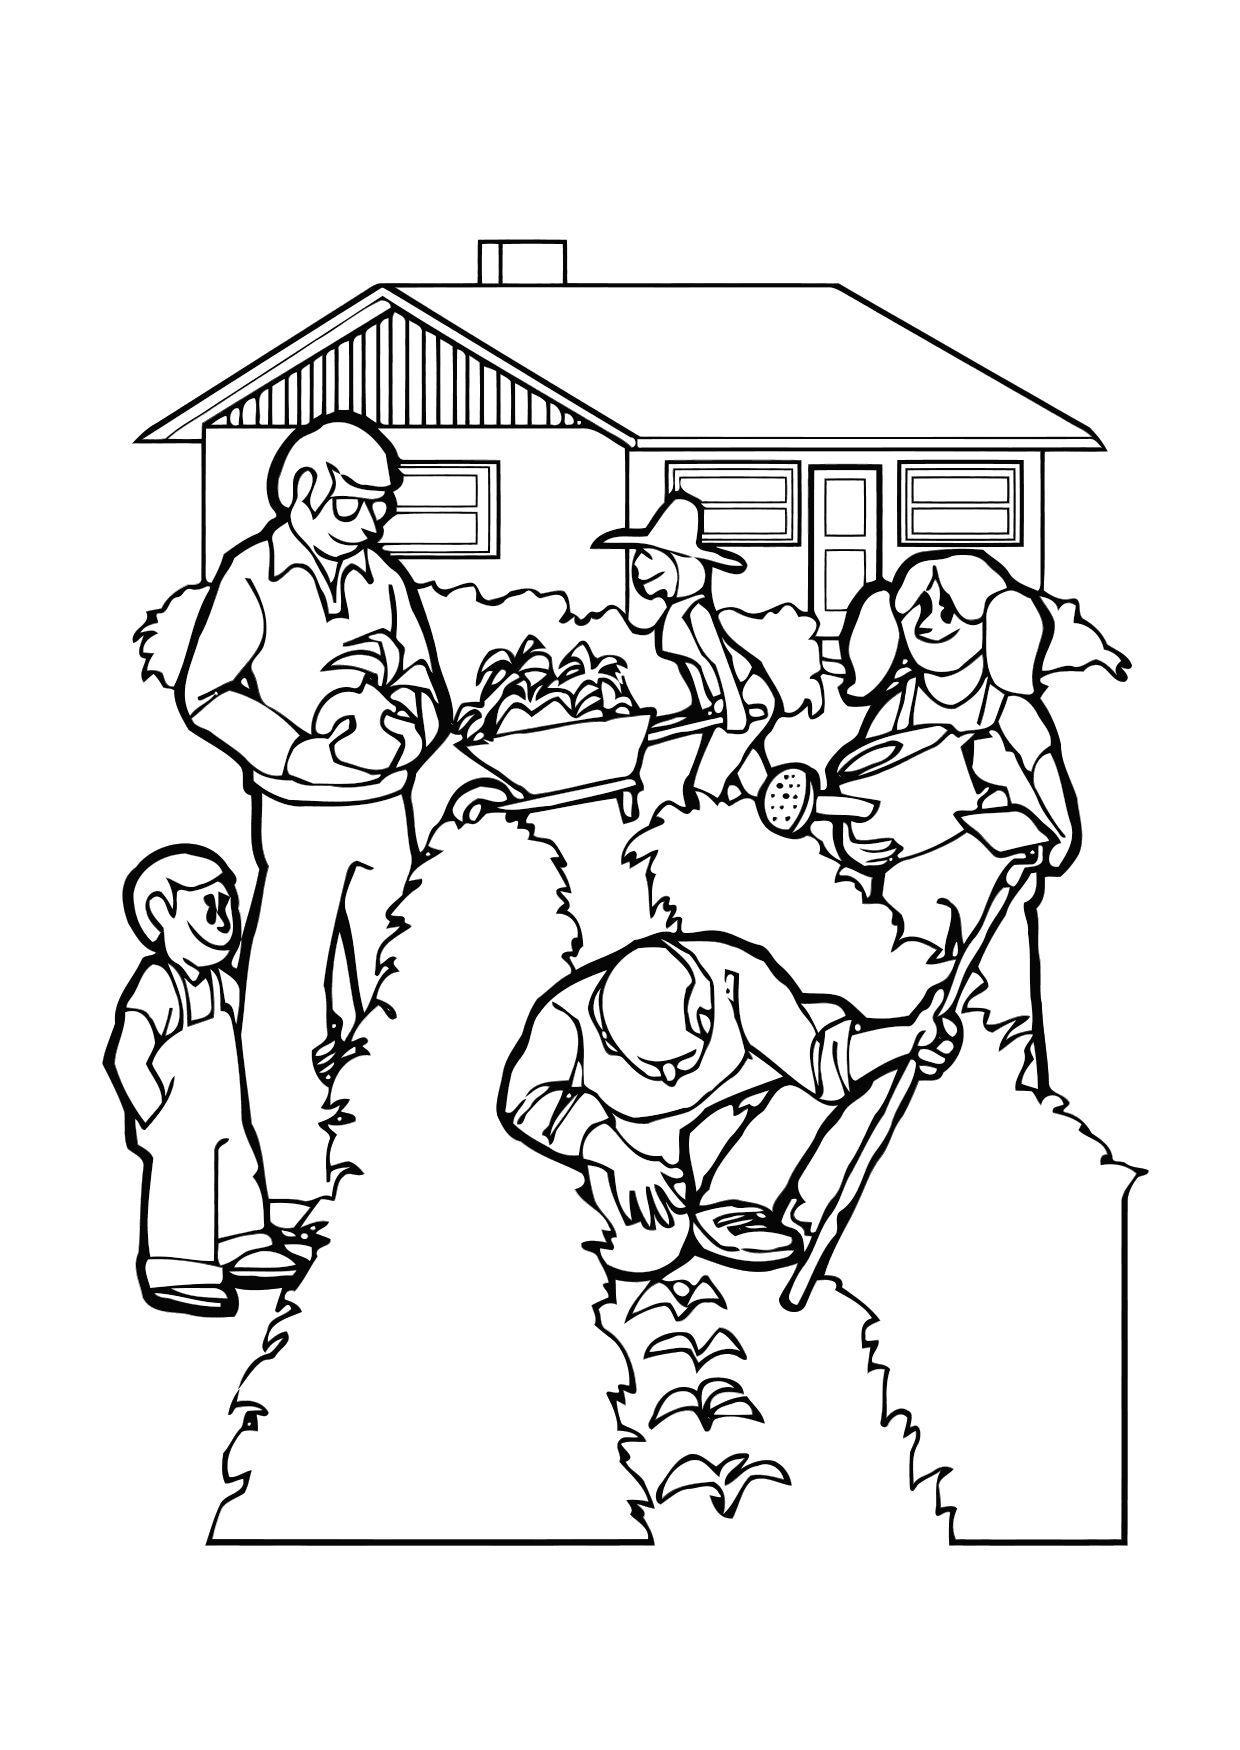 Worksheet. Dibujo para colorear Jardinera  Img 11361